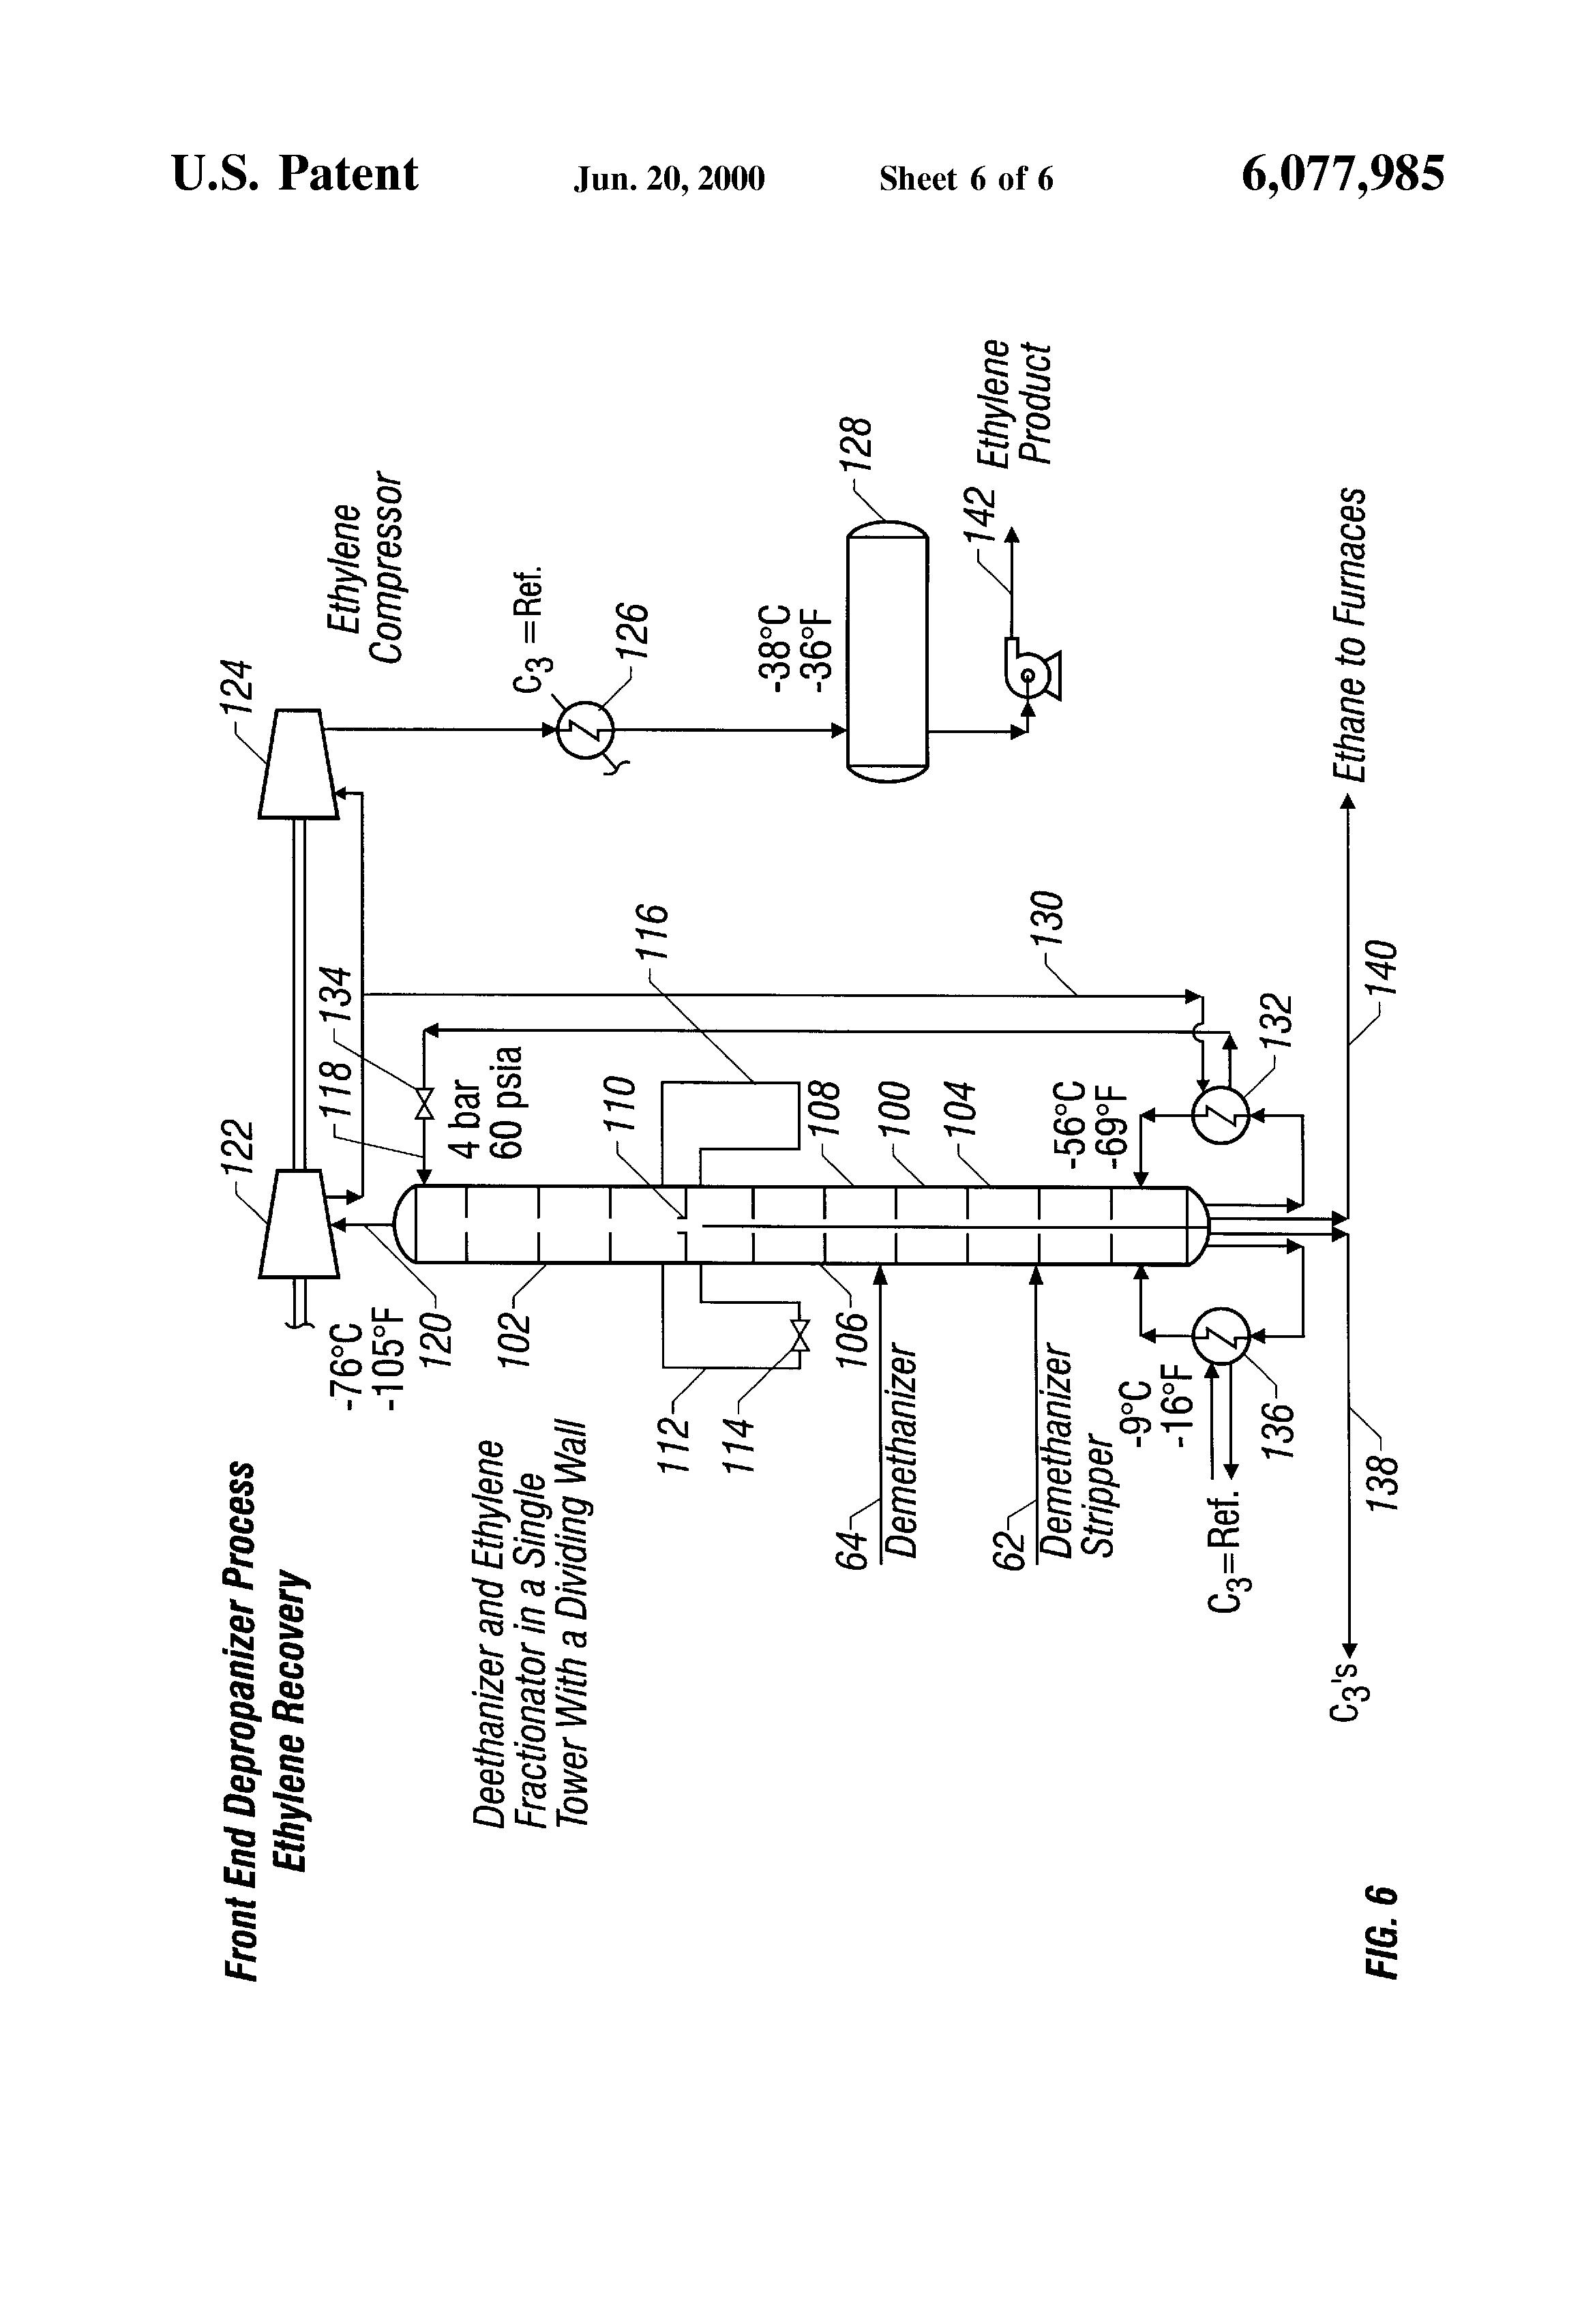 US 6077985 A - Integrated Deethanizer/ethylene Fractionation